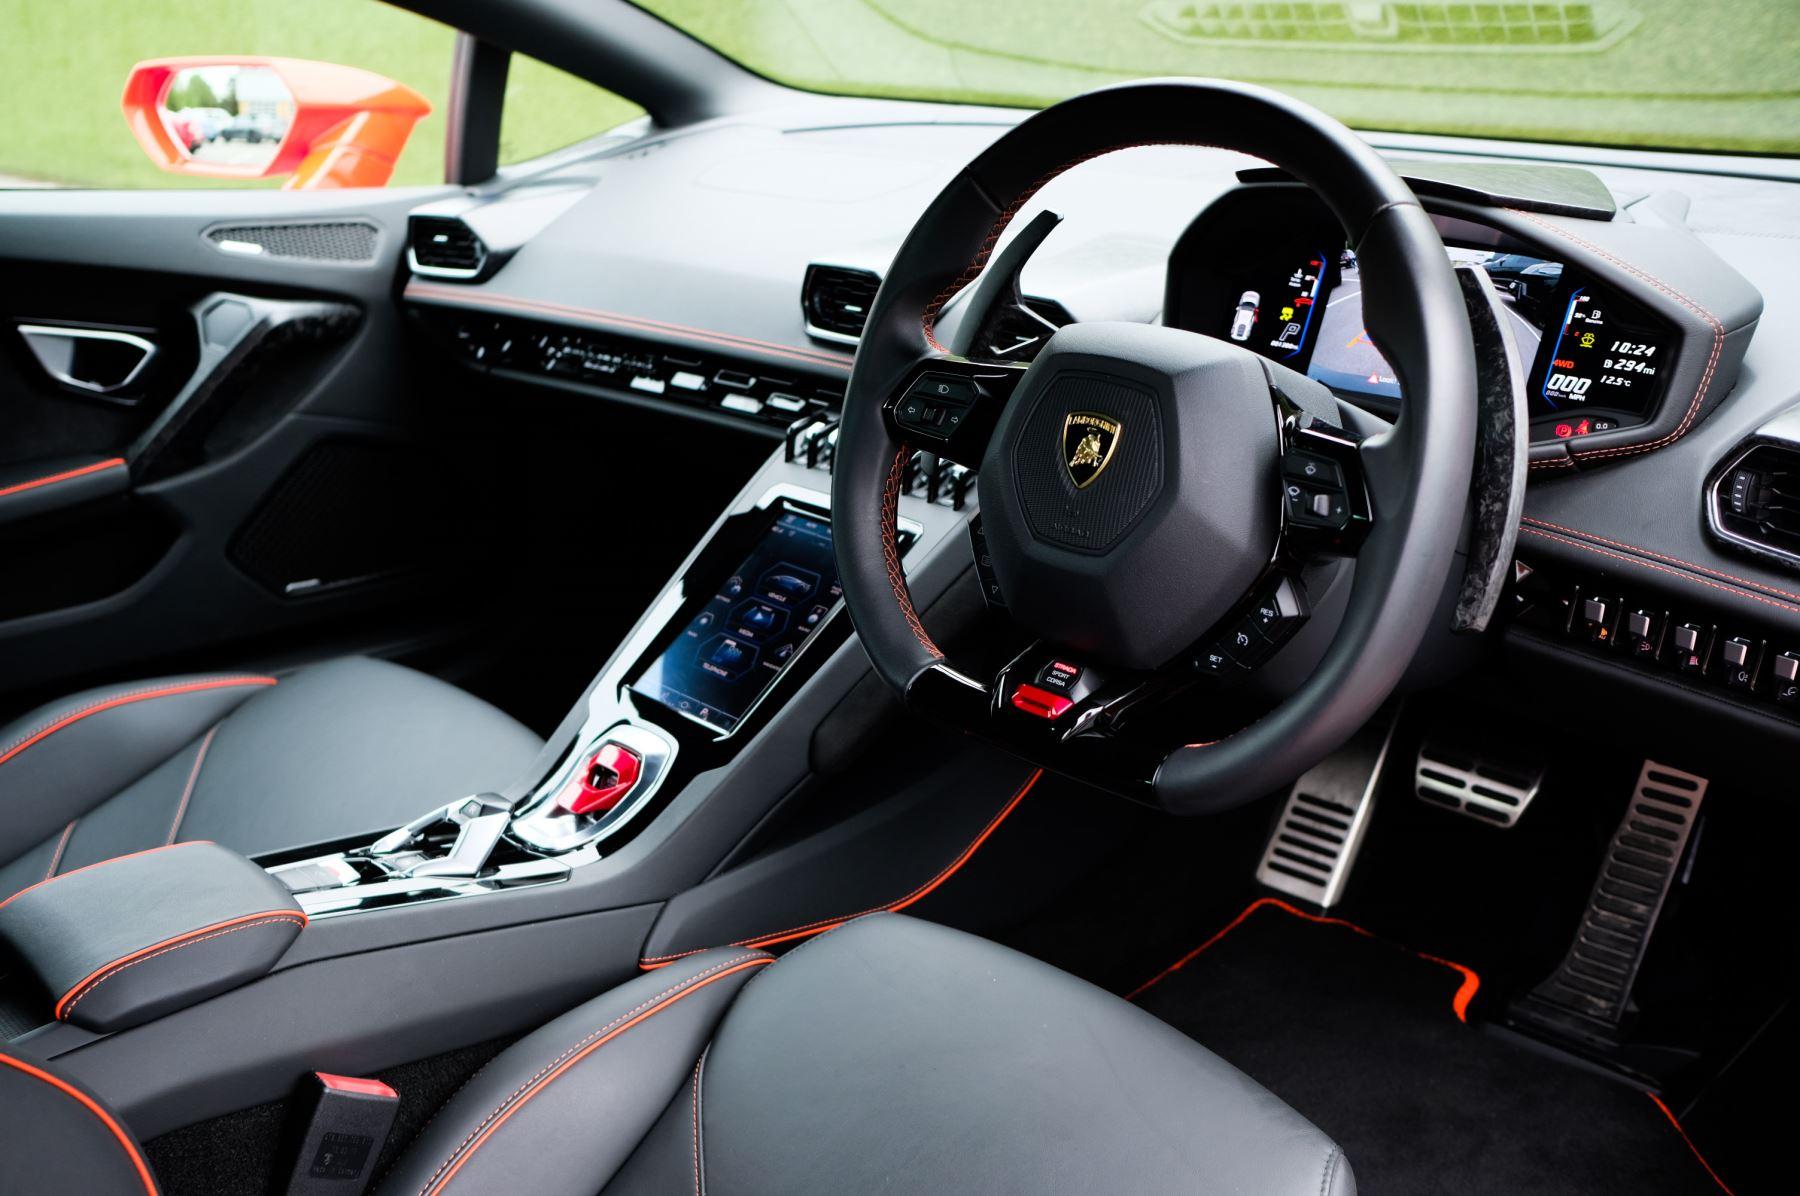 Lamborghini Huracan EVO LP 640-4 LDF image 13